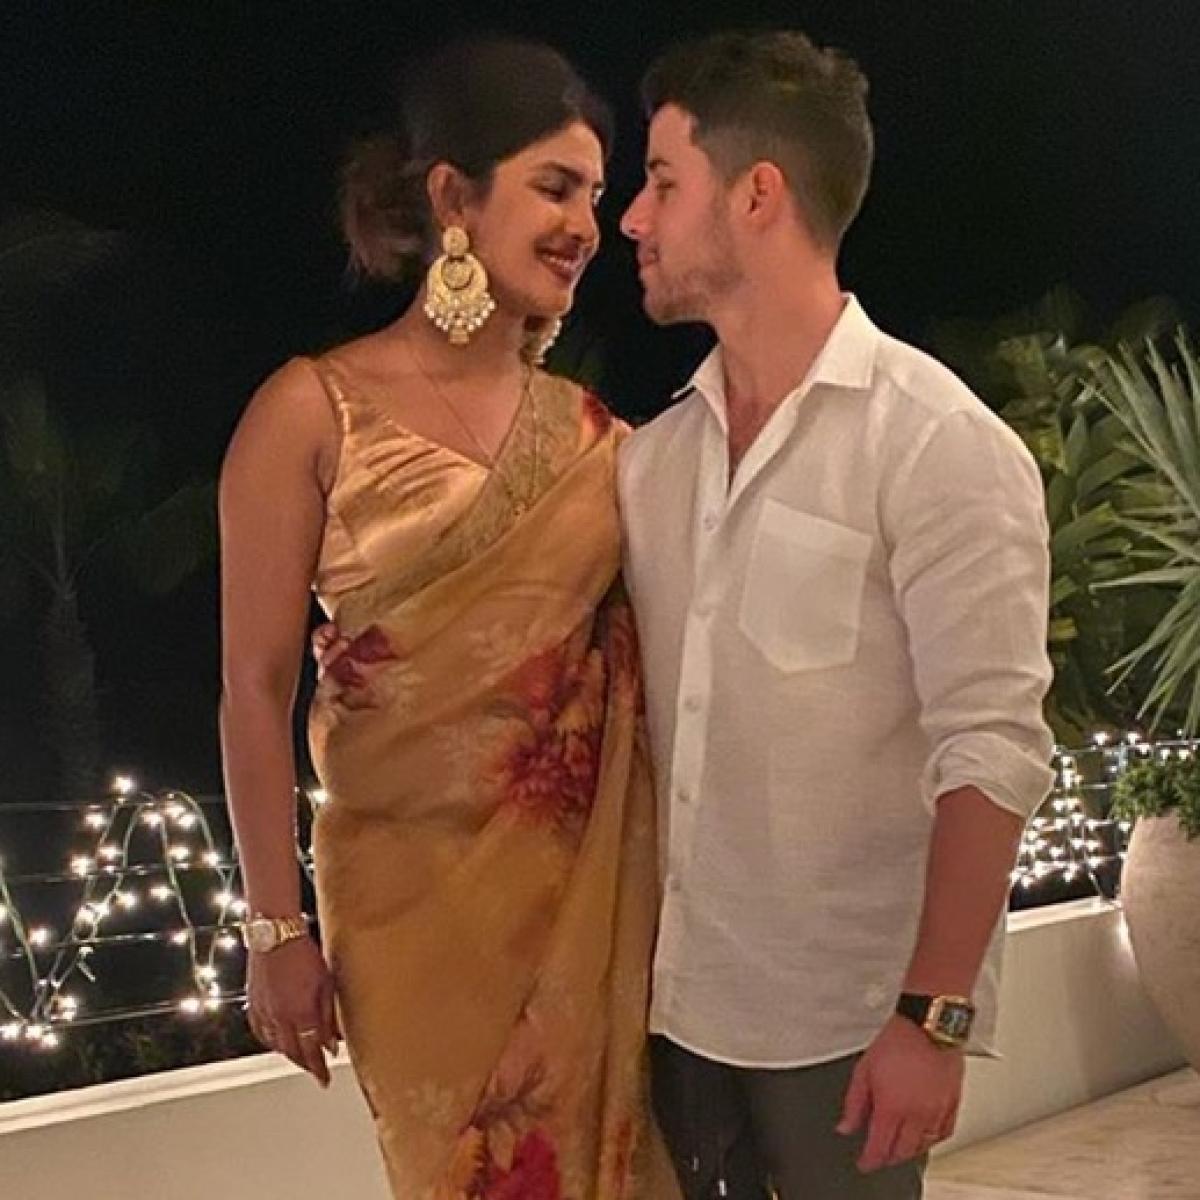 Priyanka Chopra shares hilarious video of 'National Jiju' entering a room in India